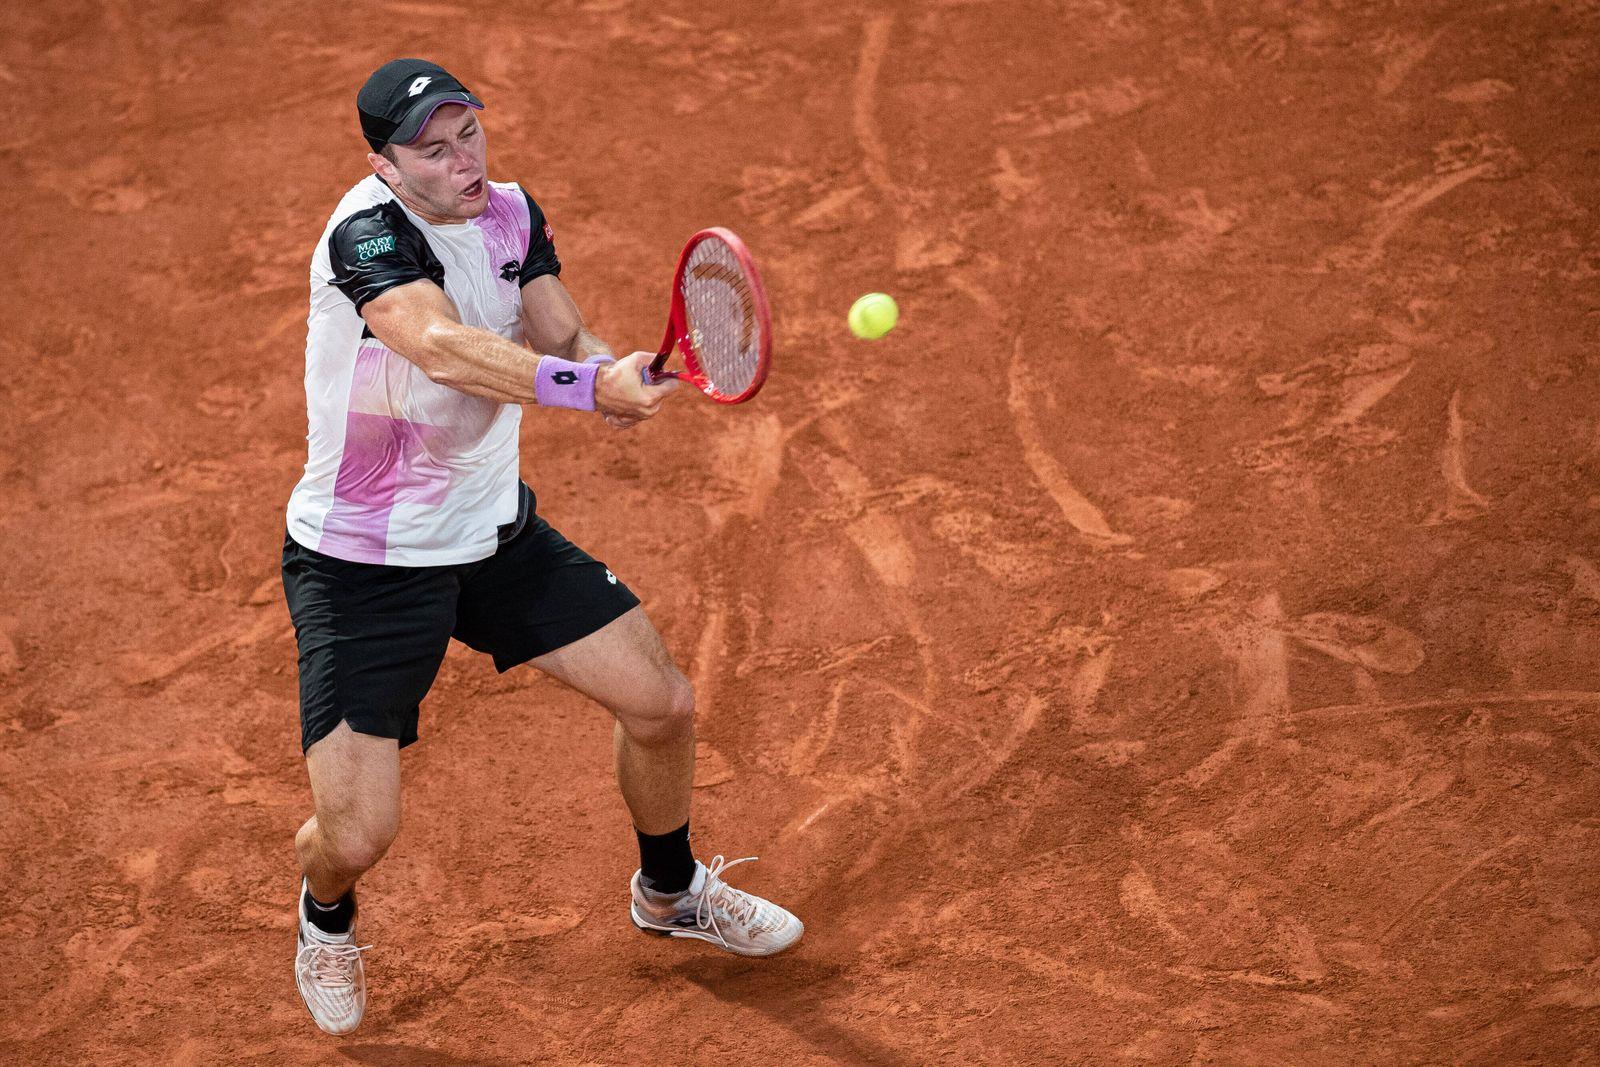 (210606) -- PARIS, June 6, 2021 -- Dominik Koepfer of Germany returns the ball during the men s singles third round matc